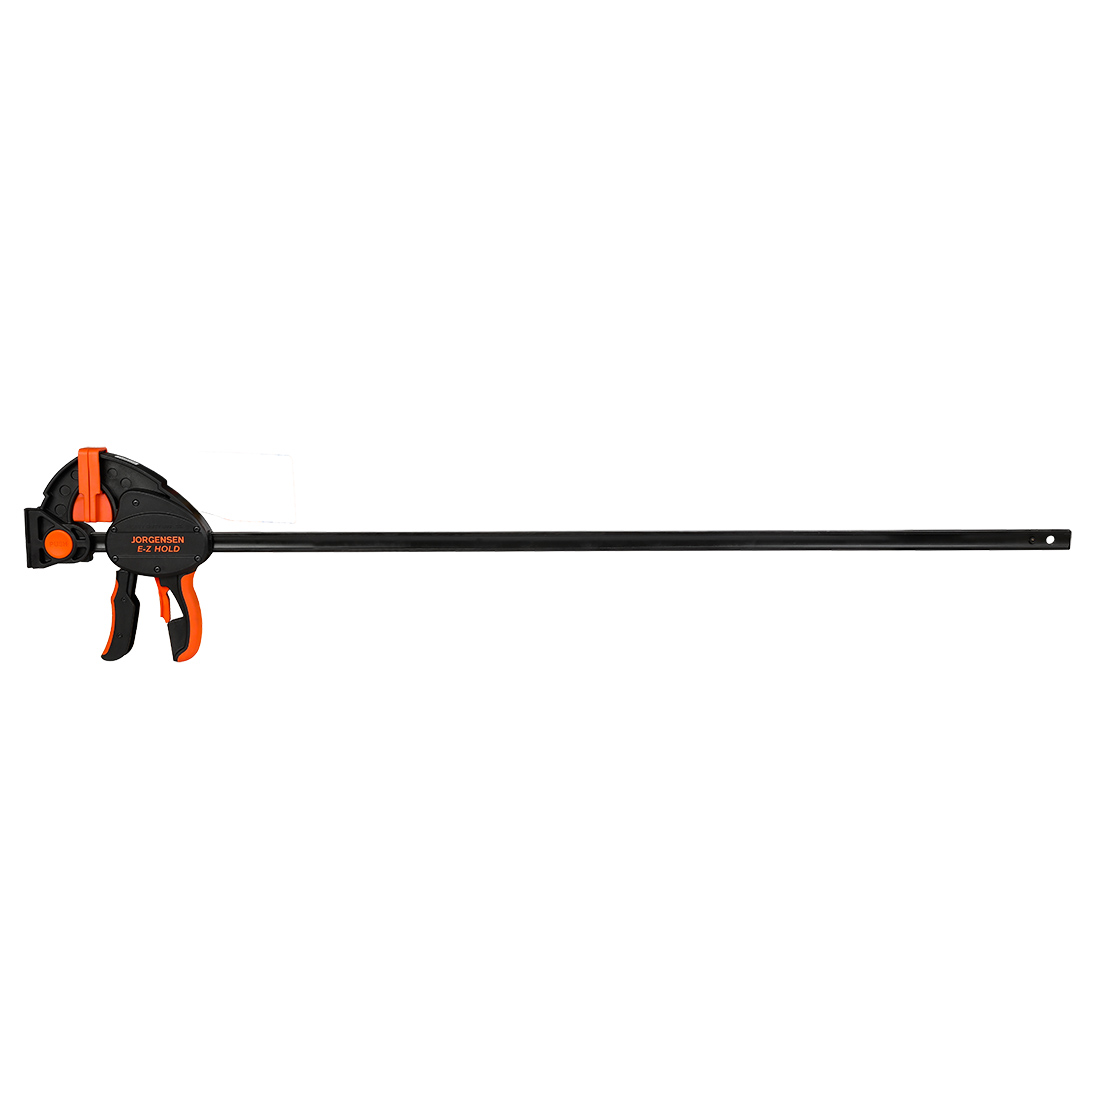 E-Z Hold Bar Clamp Heavy Duty 900mm - 272kg AJP33736